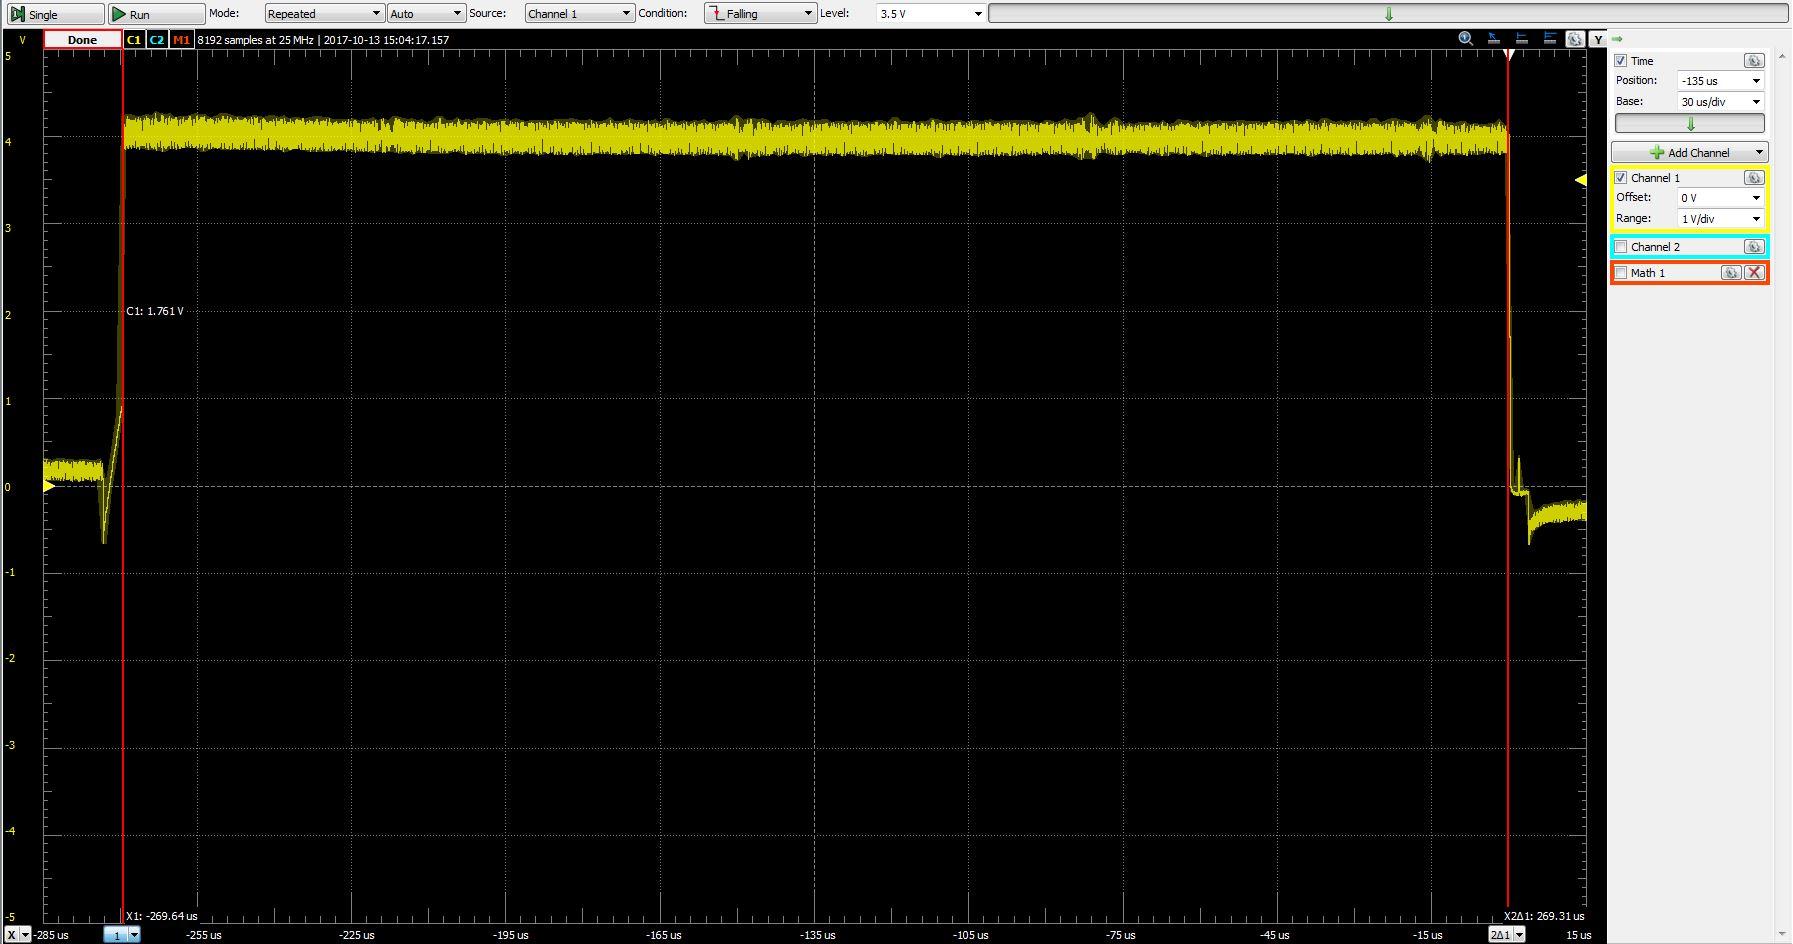 Single full intensity LED pulse at 8Mhz. 269.3μs/LED * 64 LEDs = 58.0fps.